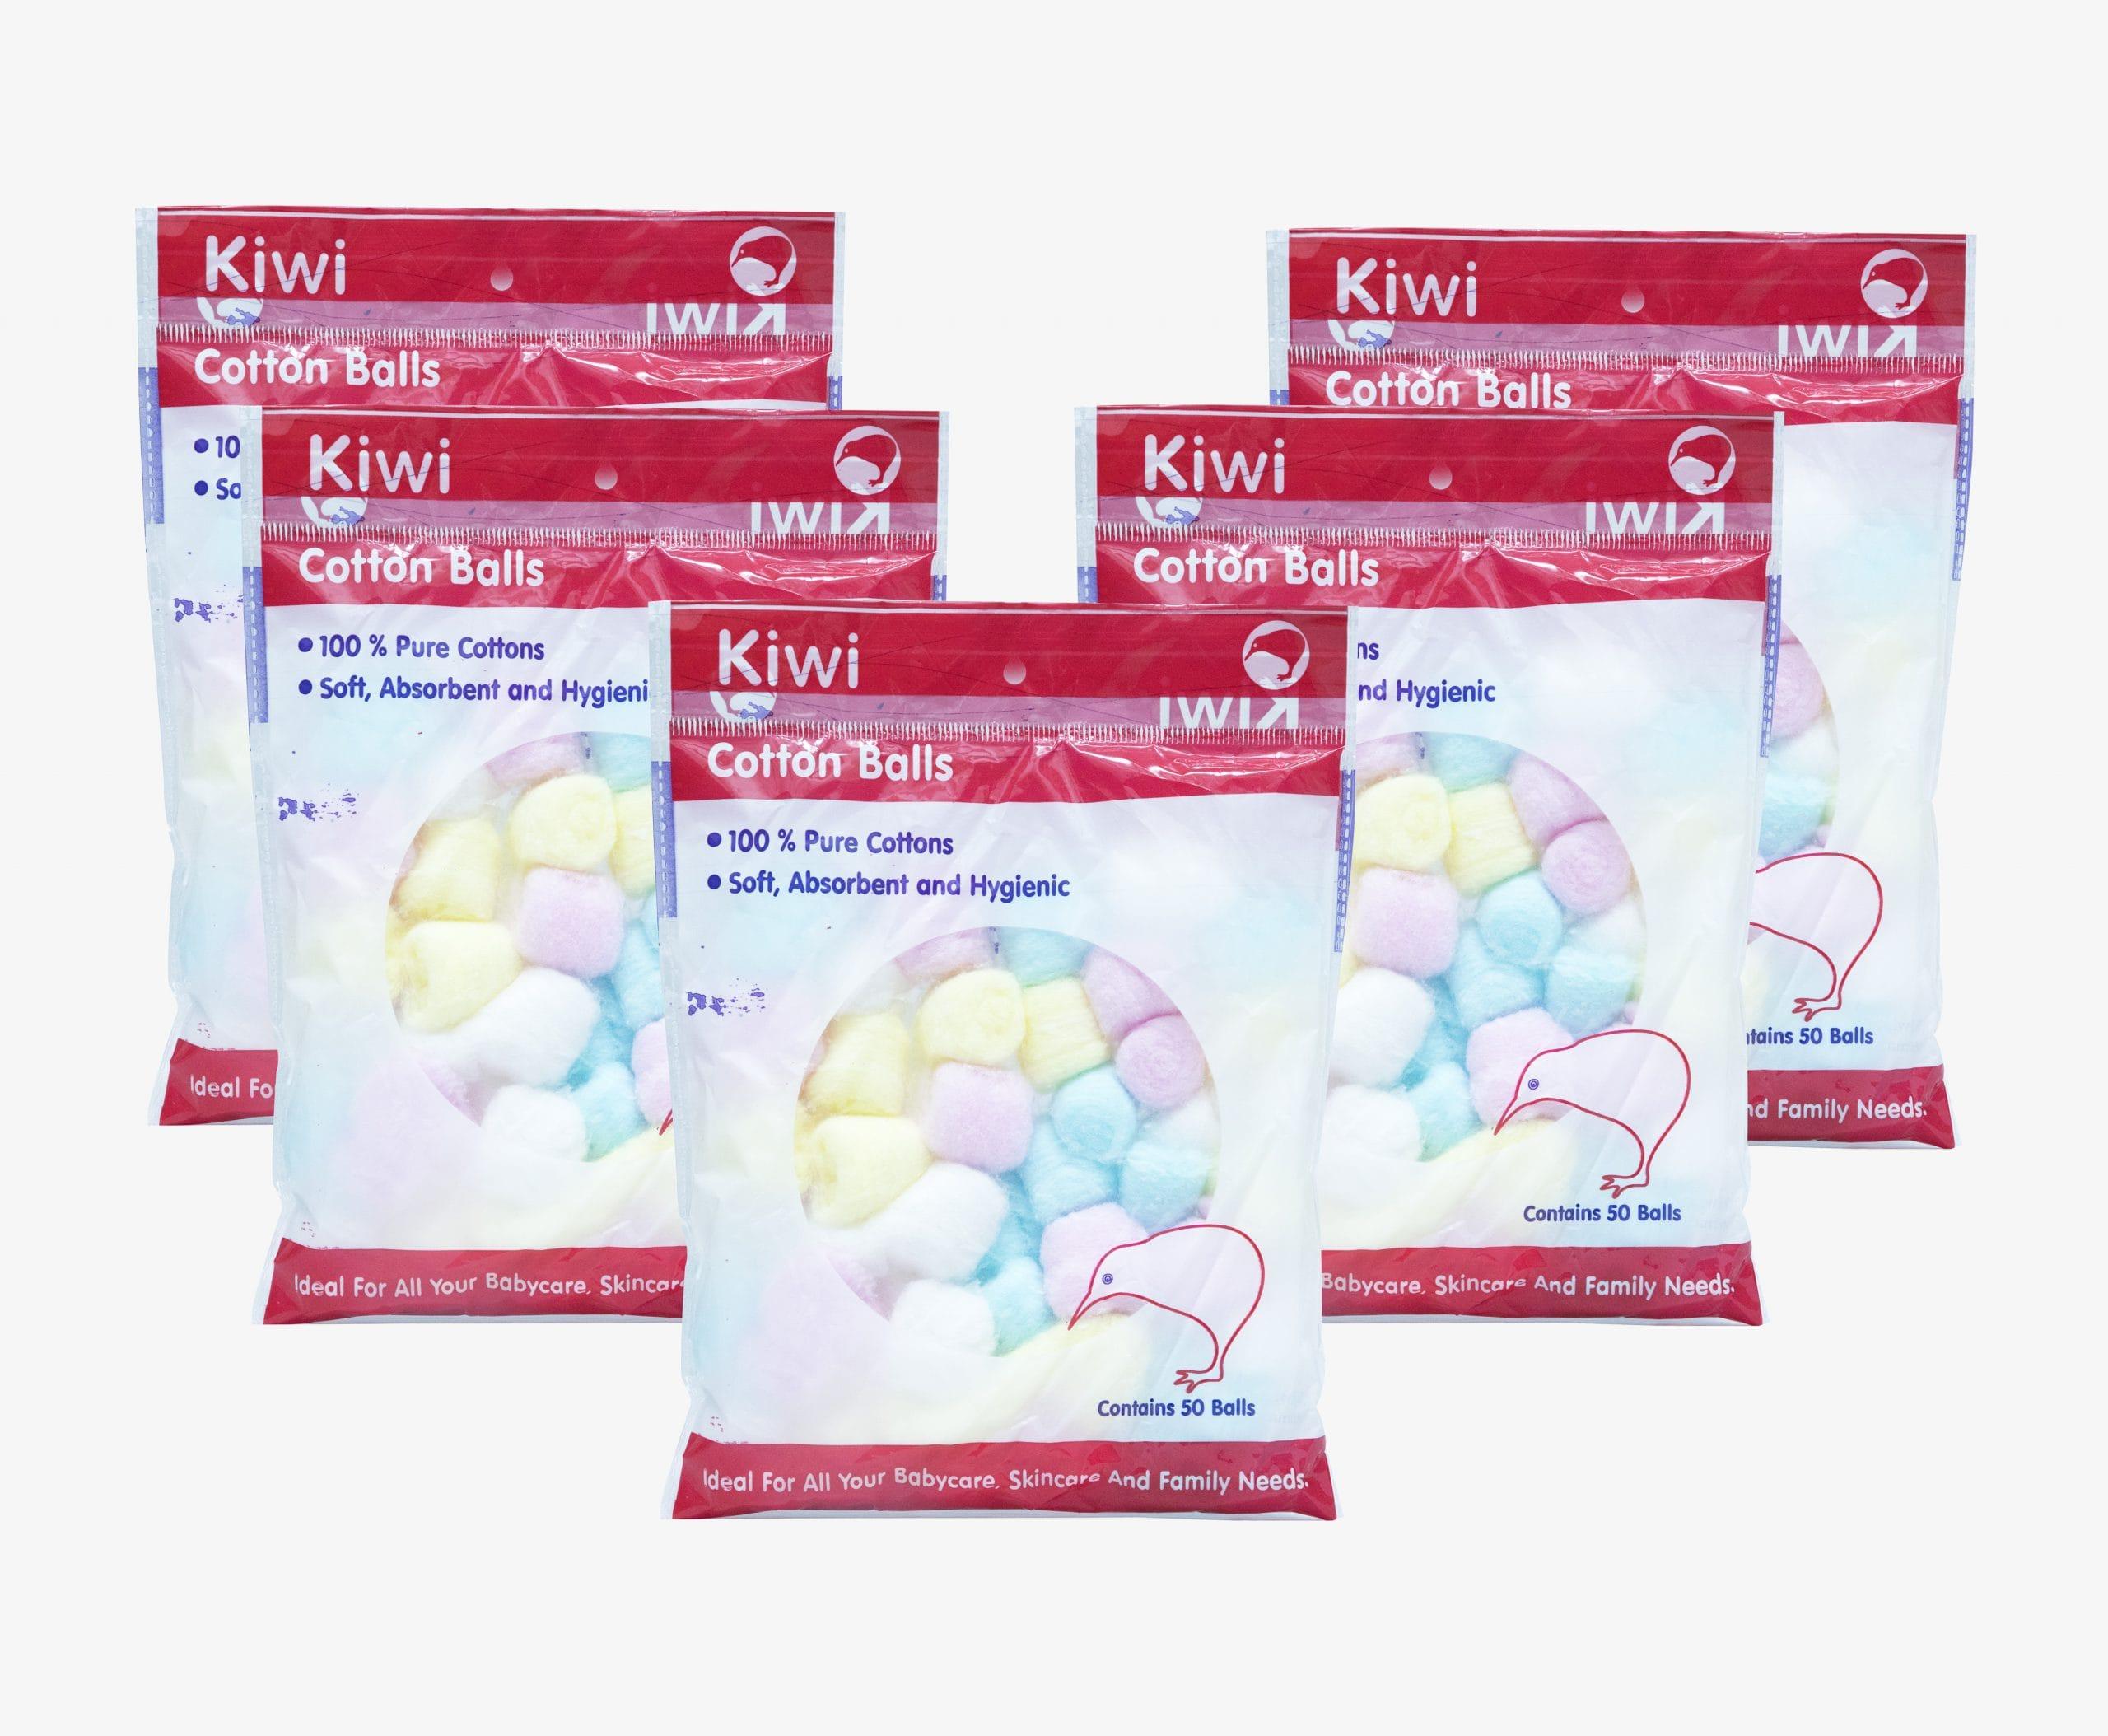 Kiwi Multicolor Cotton Balls (Pack of 5x50)